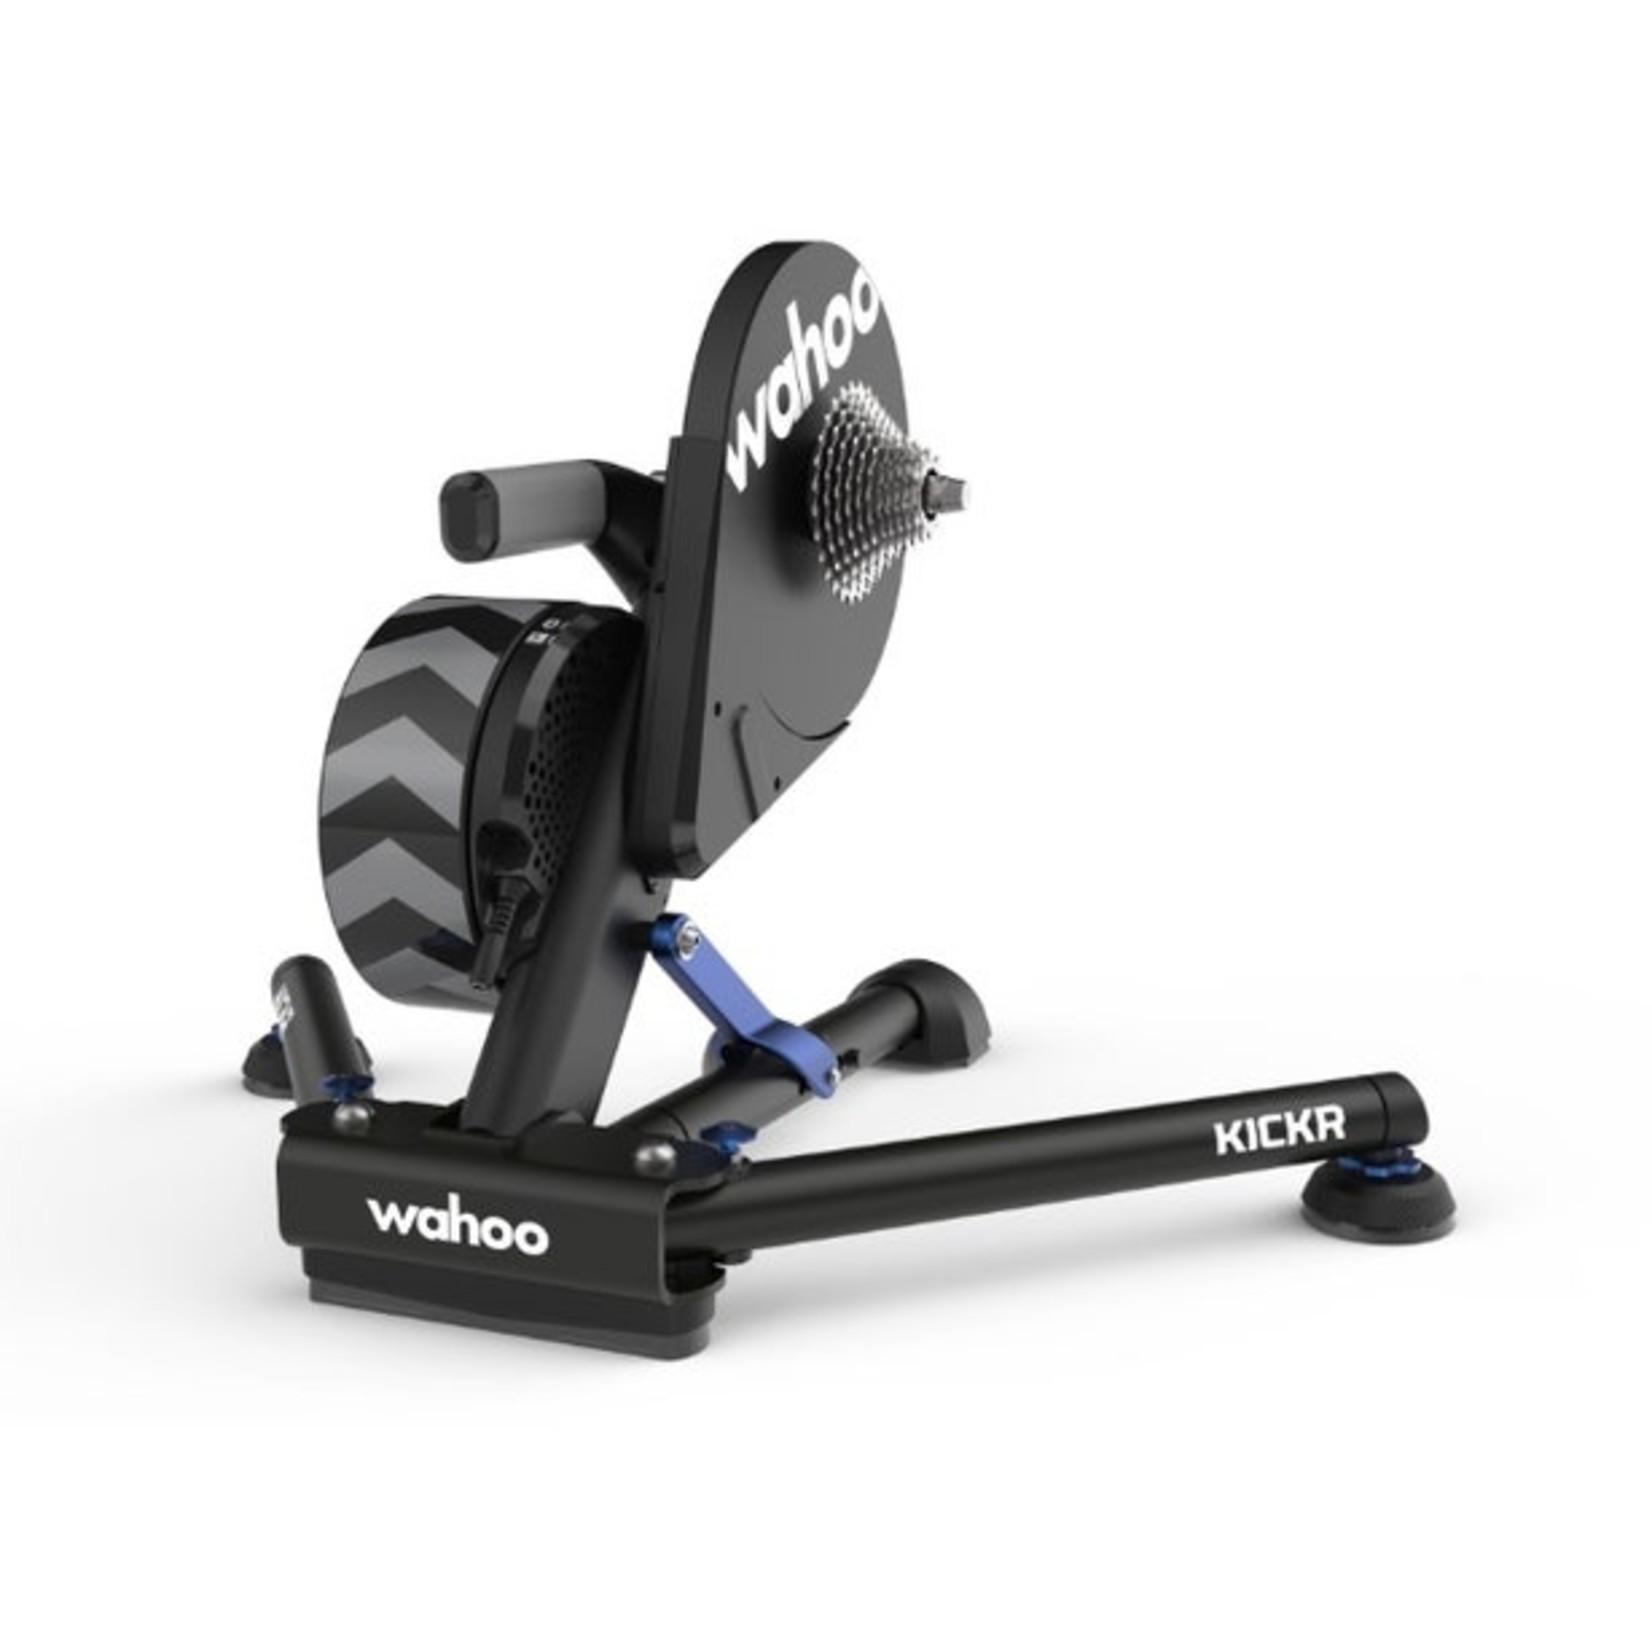 WAHOO Wahoo Kickr smart power trainer